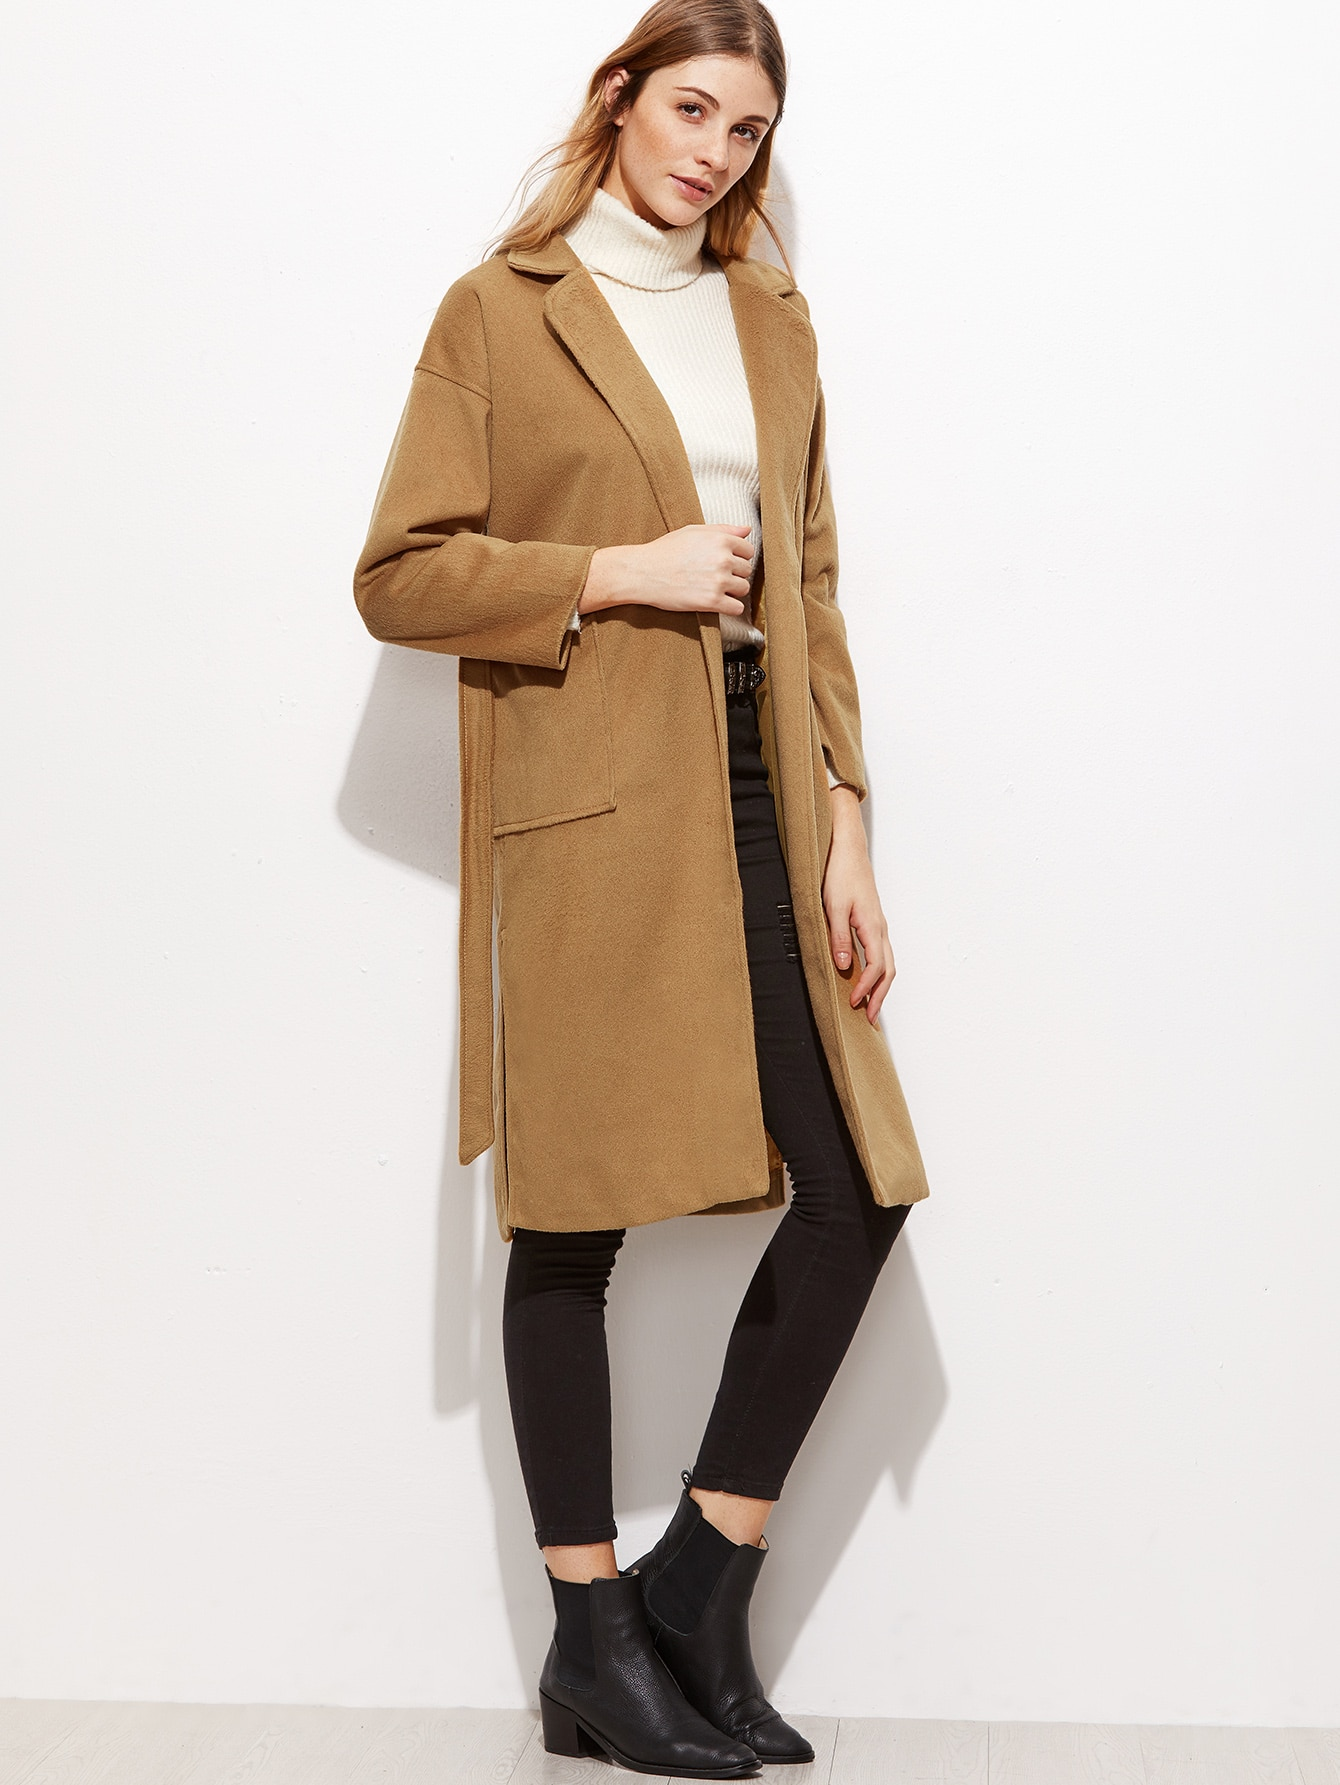 Khaki Wool Blend Split Side Long CoatKhaki Wool Blend Split Side Long Coat<br><br>color: Khaki<br>size: one-size